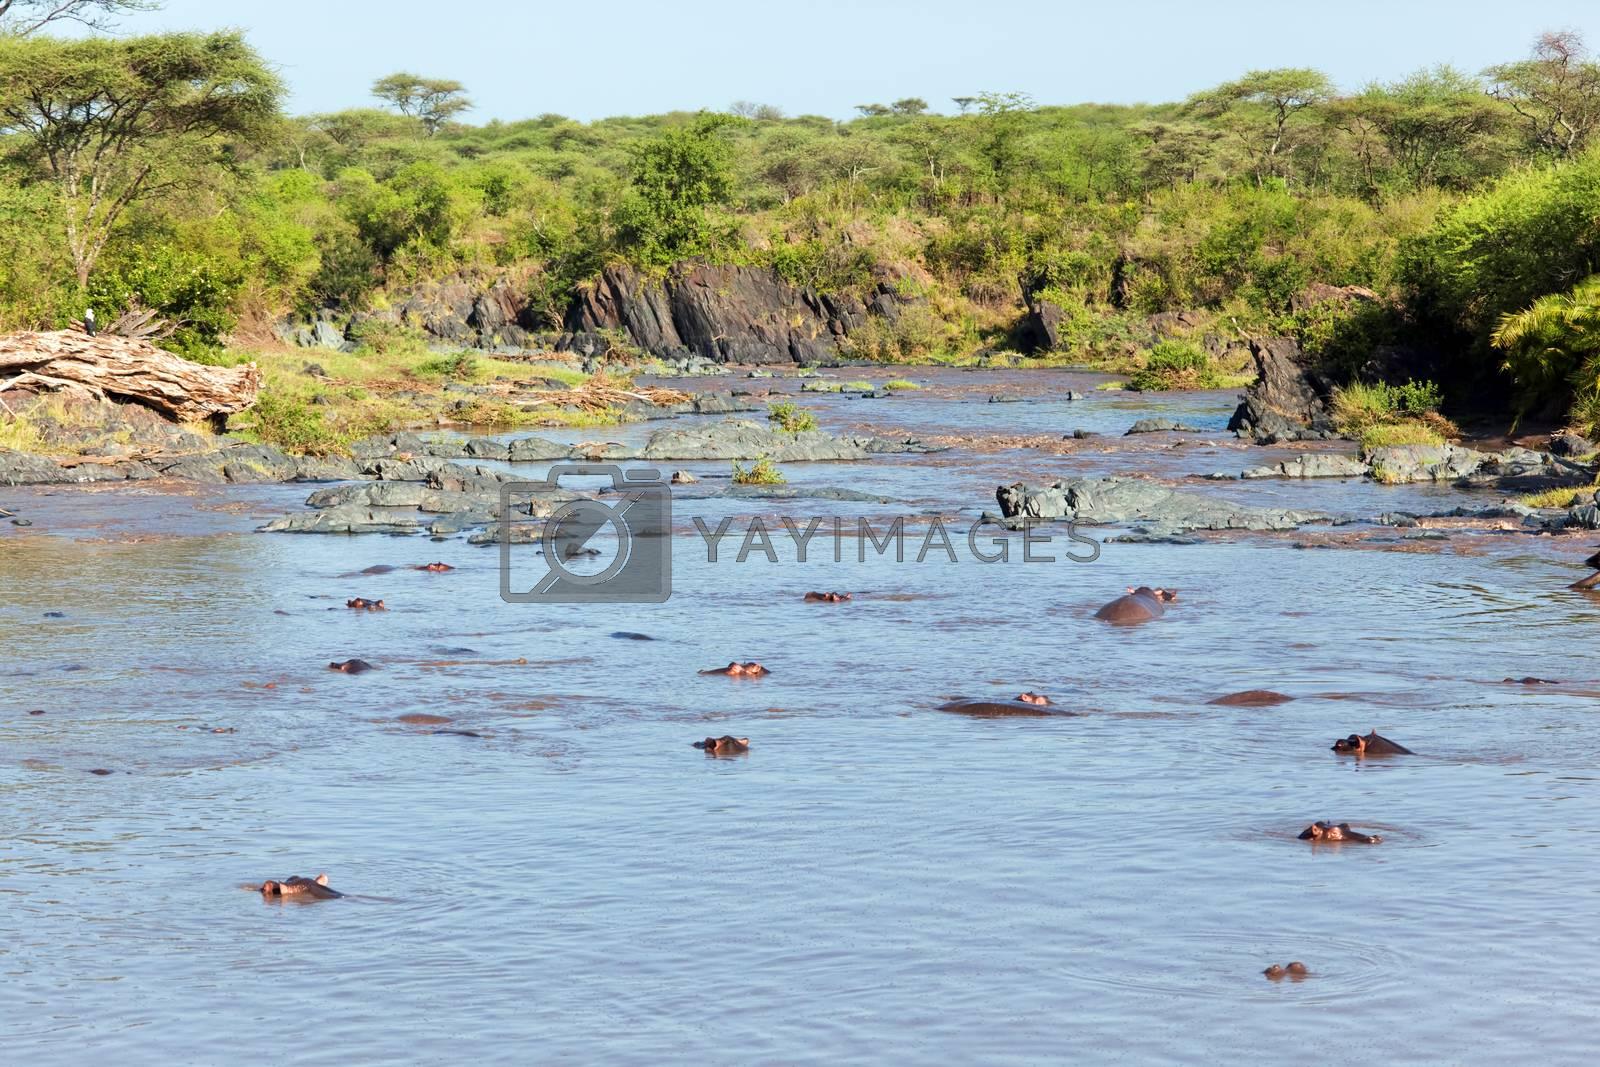 Royalty free image of Hippo, hippopotamus in river. Serengeti, Tanzania, Africa by photocreo